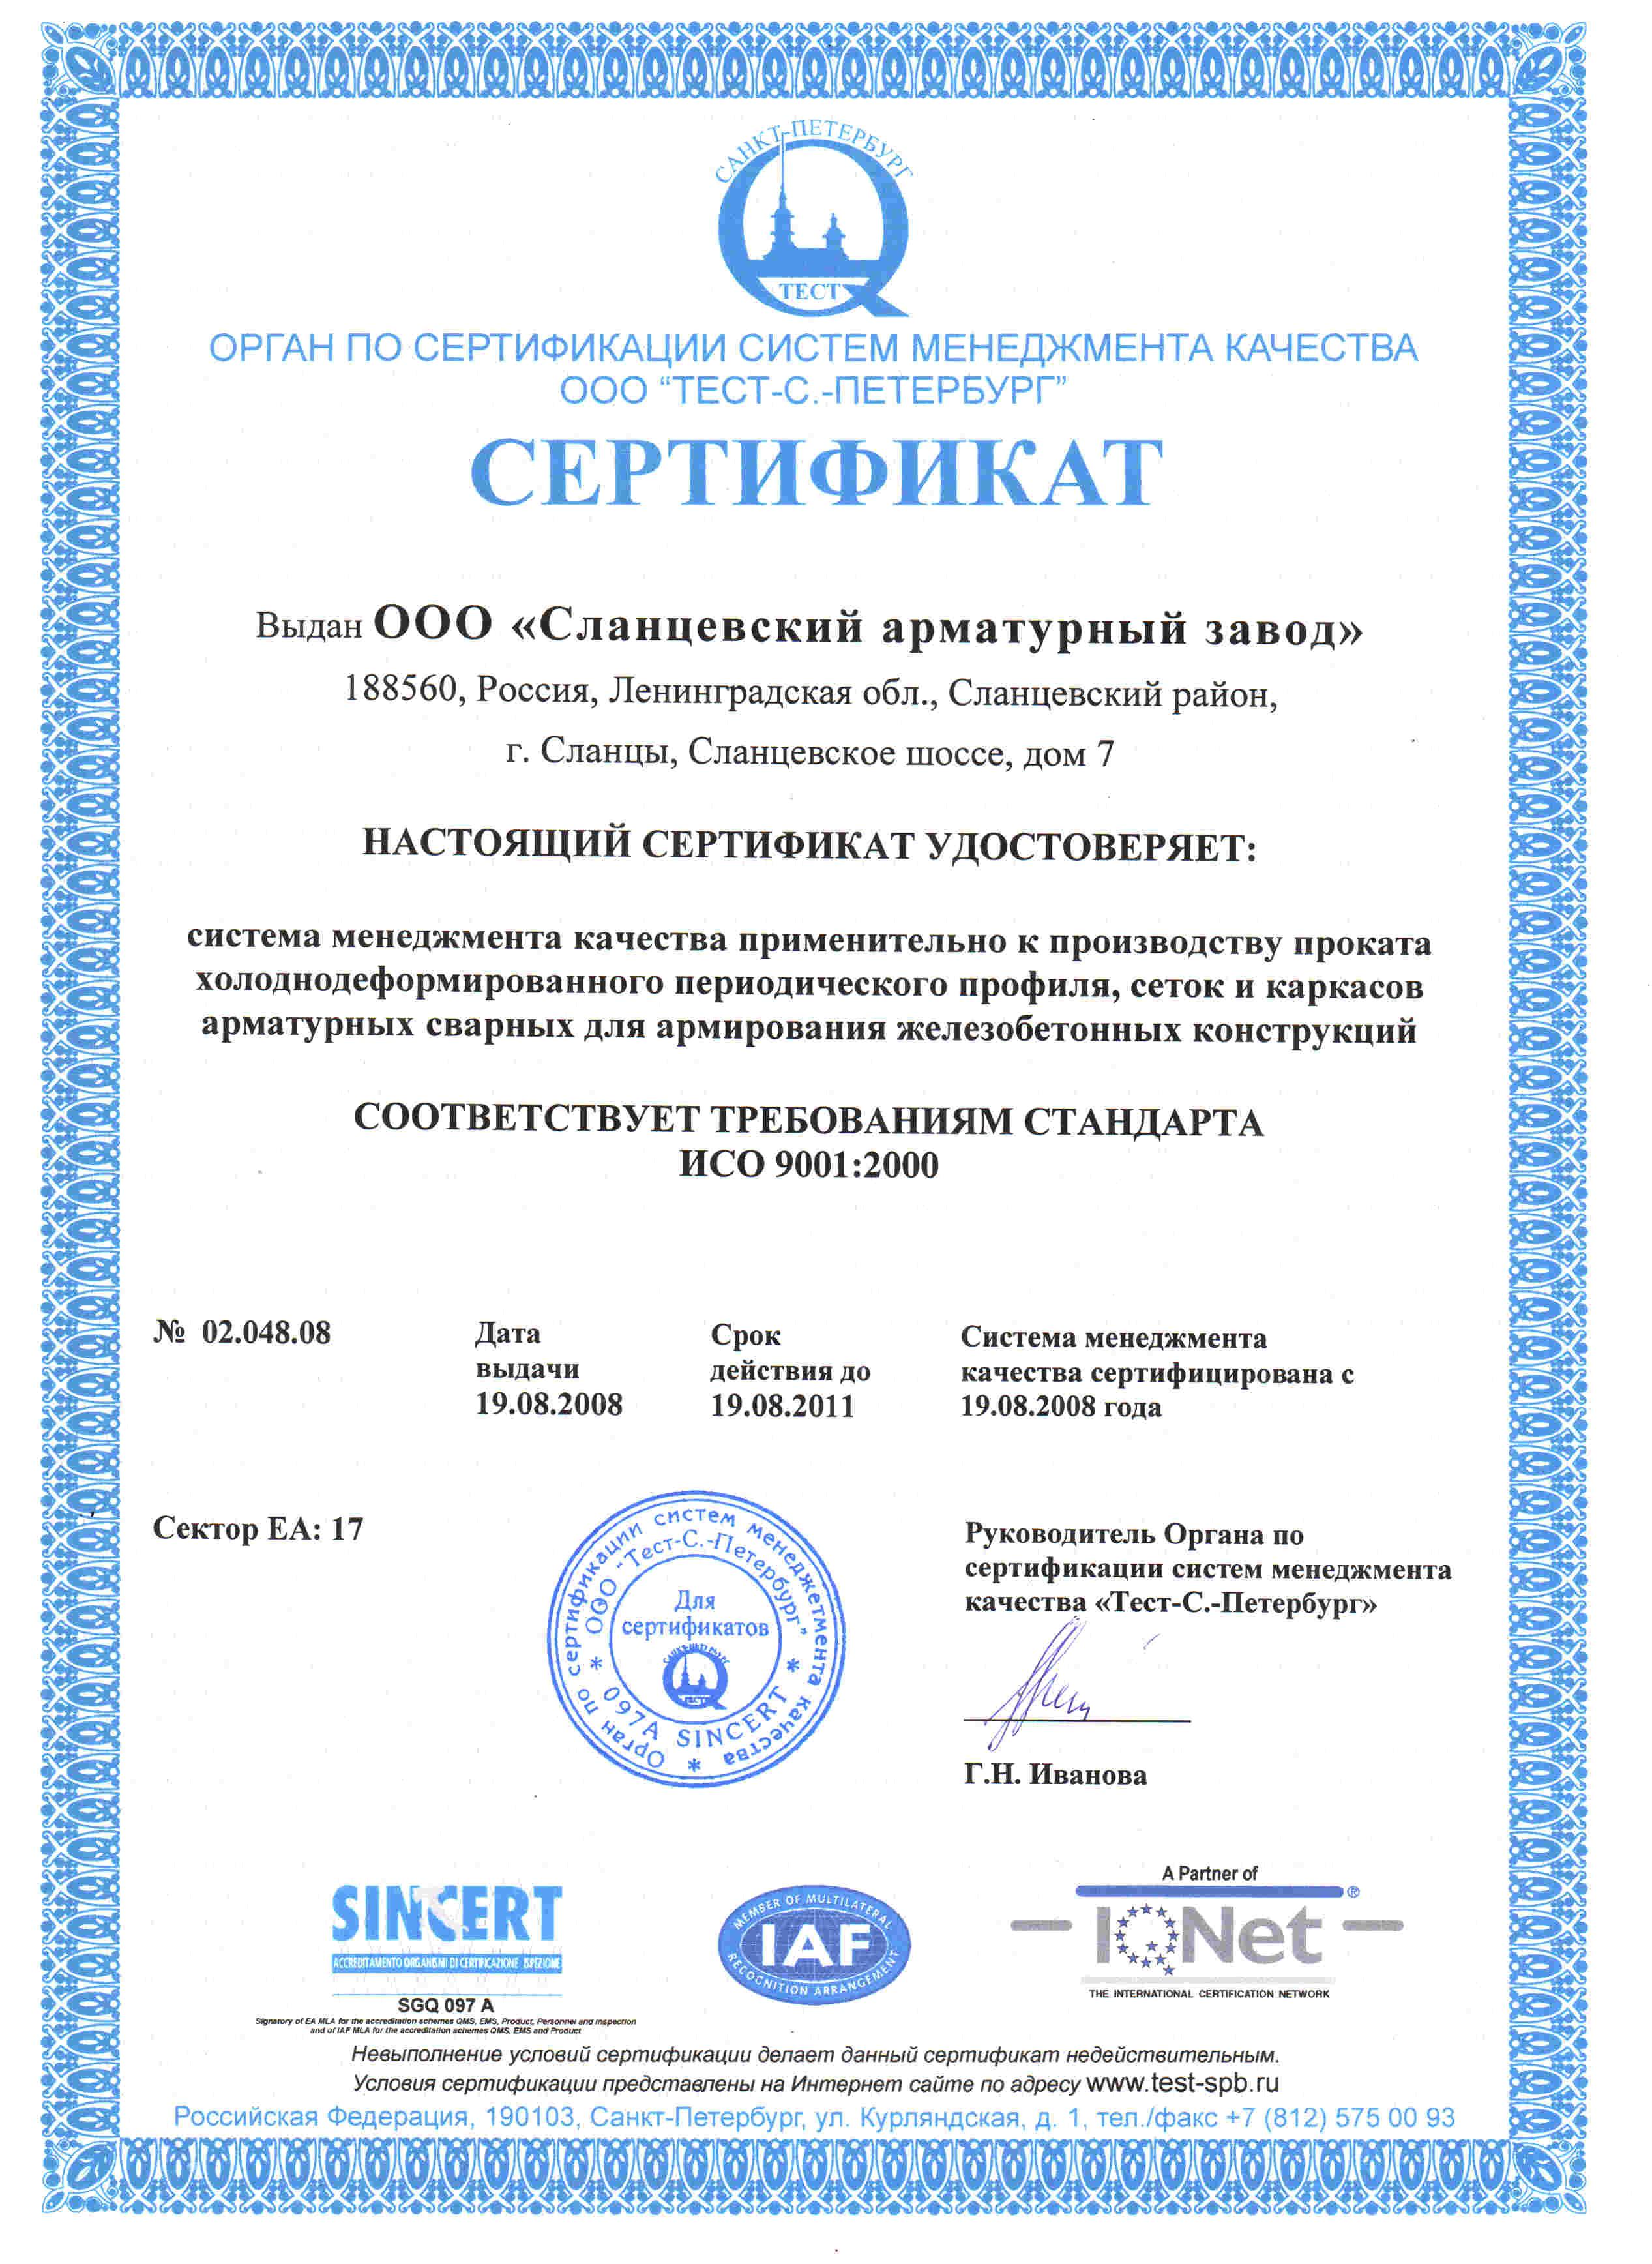 сертификат: